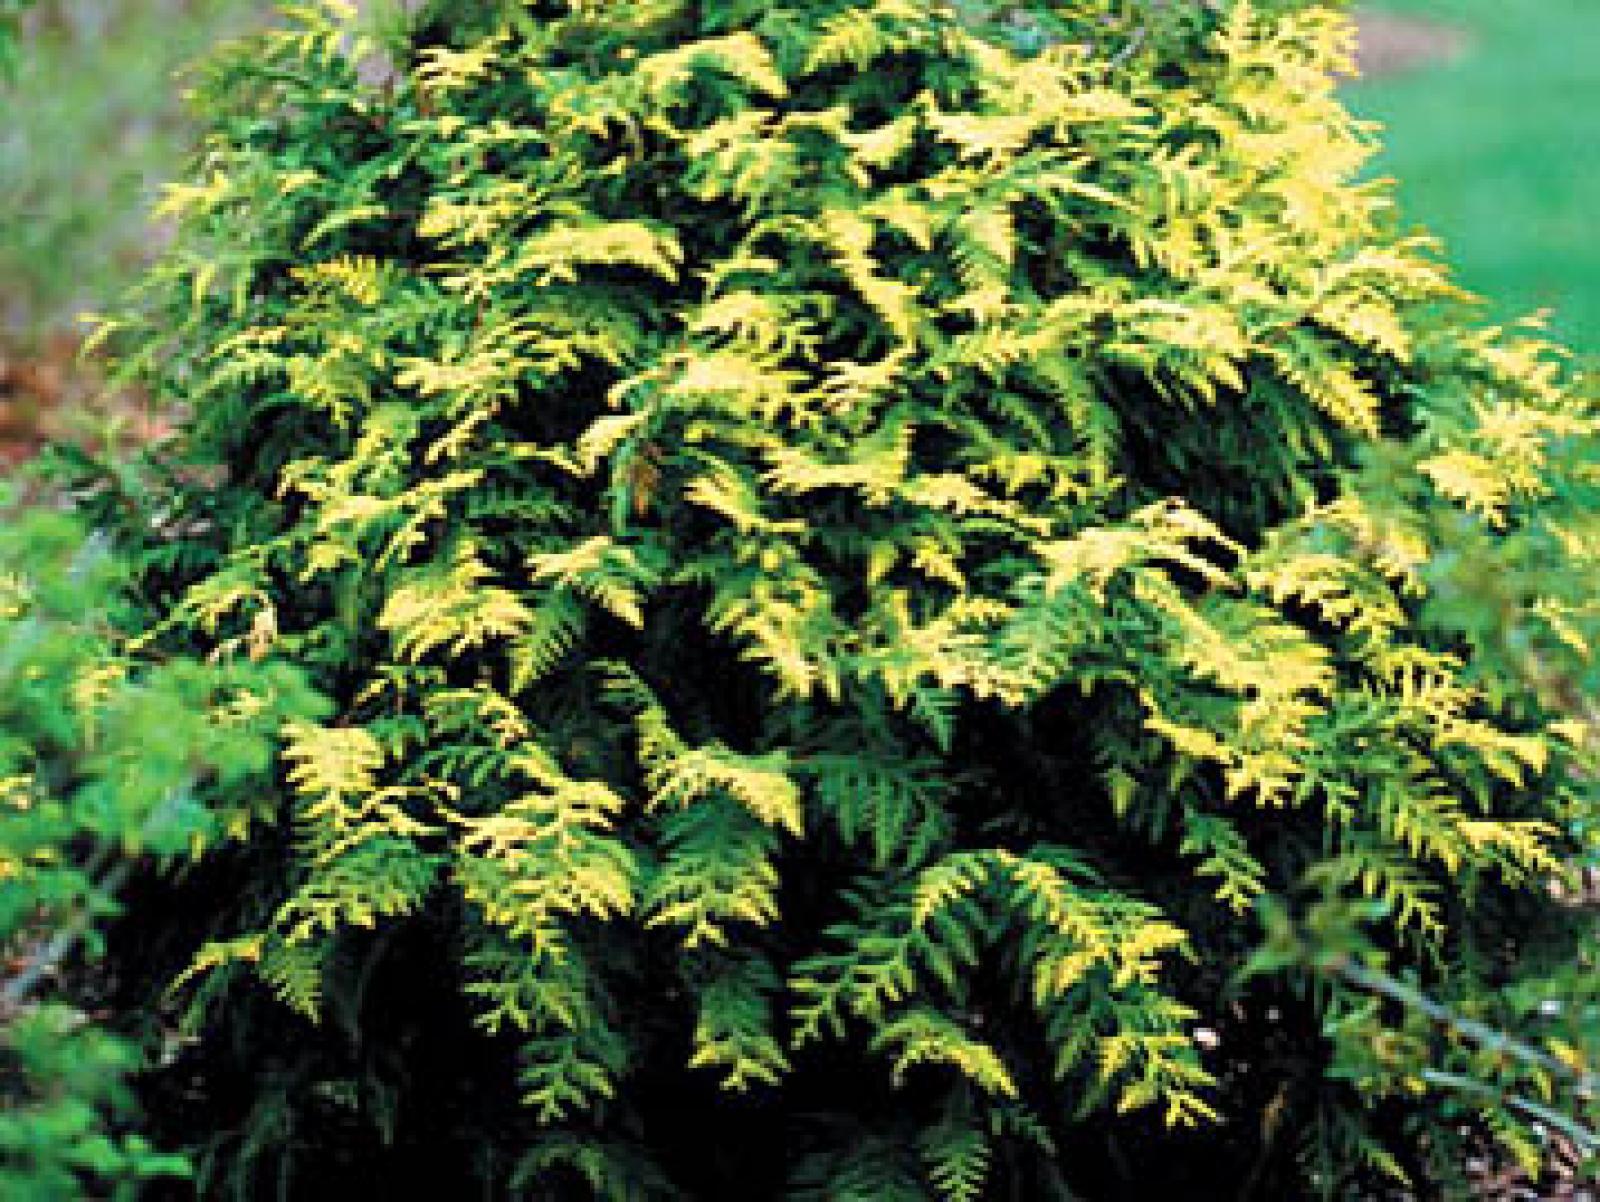 'Thuja' family of evergreens